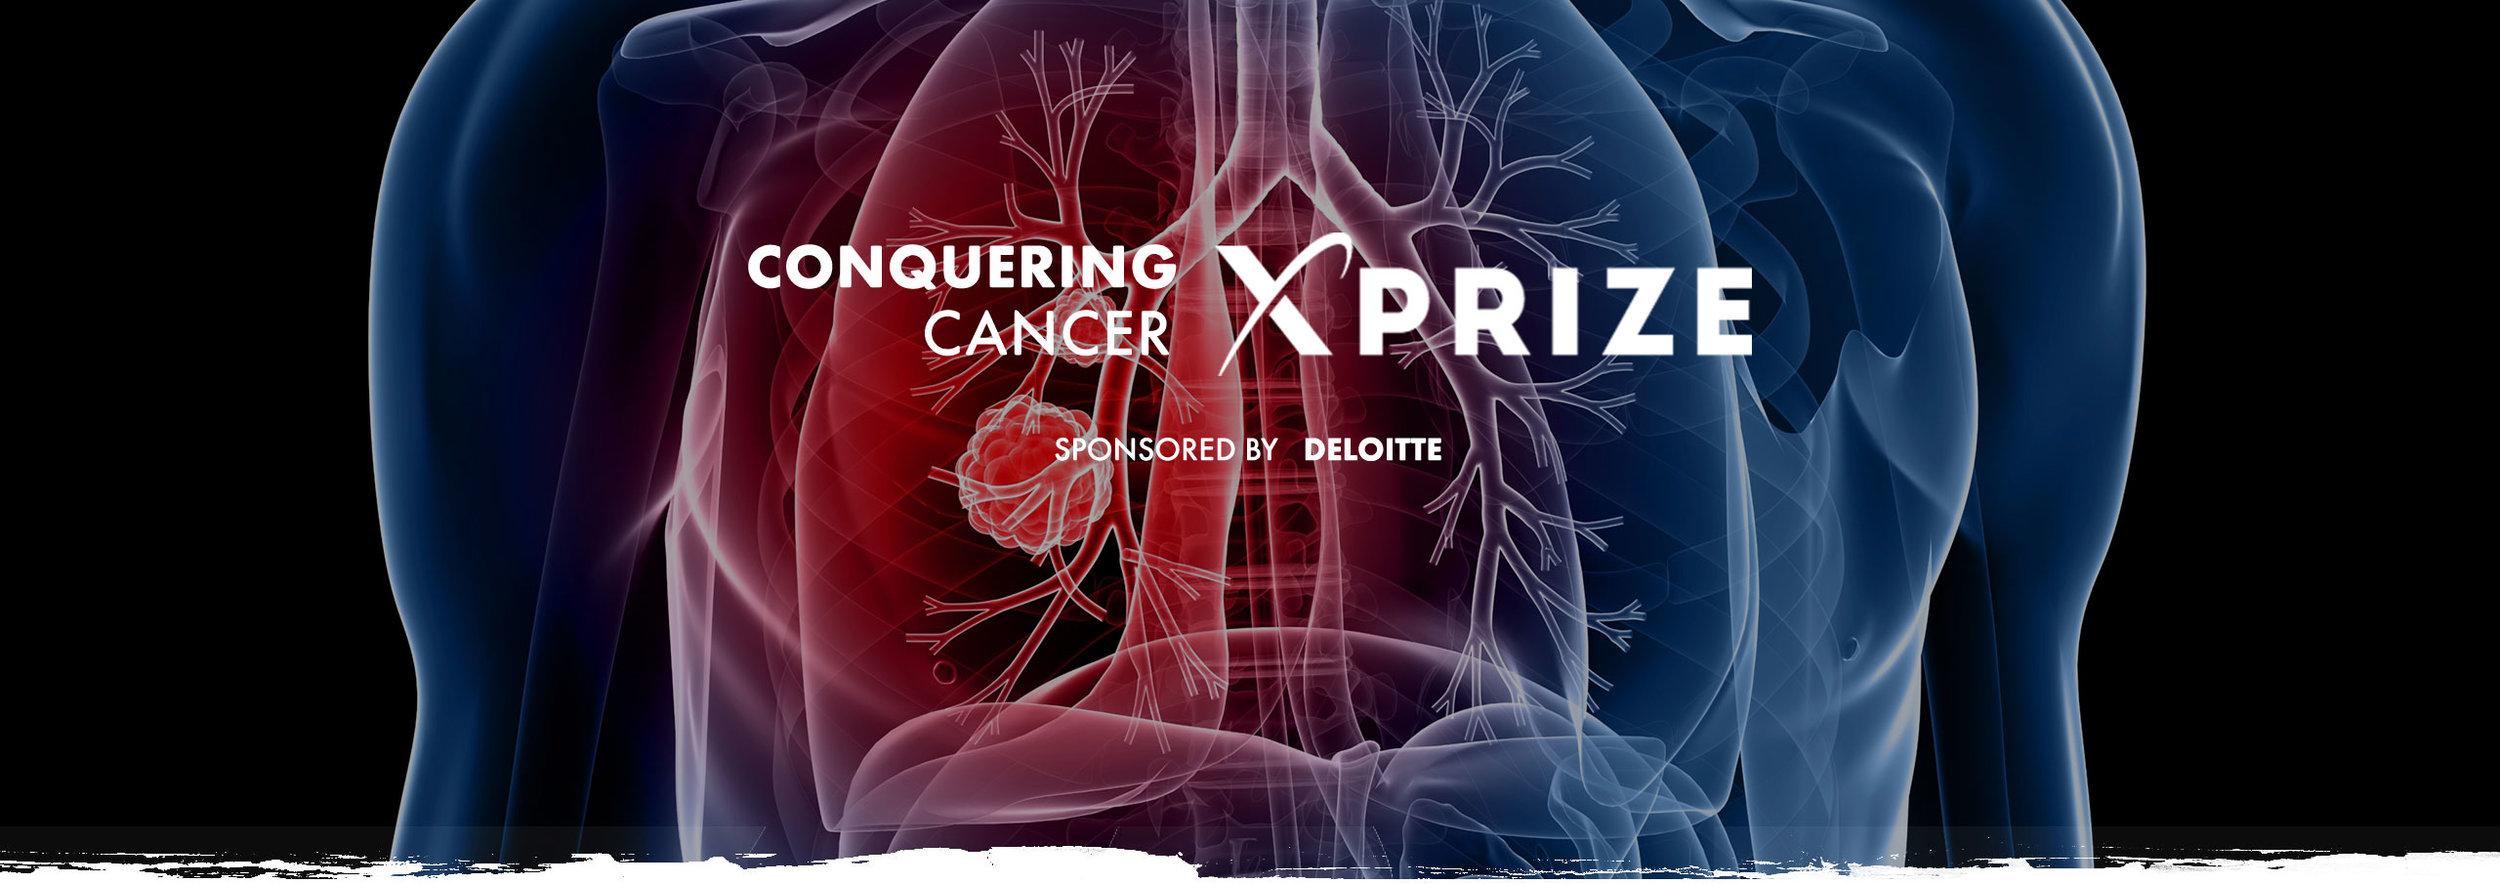 conquering_cancer_header_wlogo_2560x905.jpeg